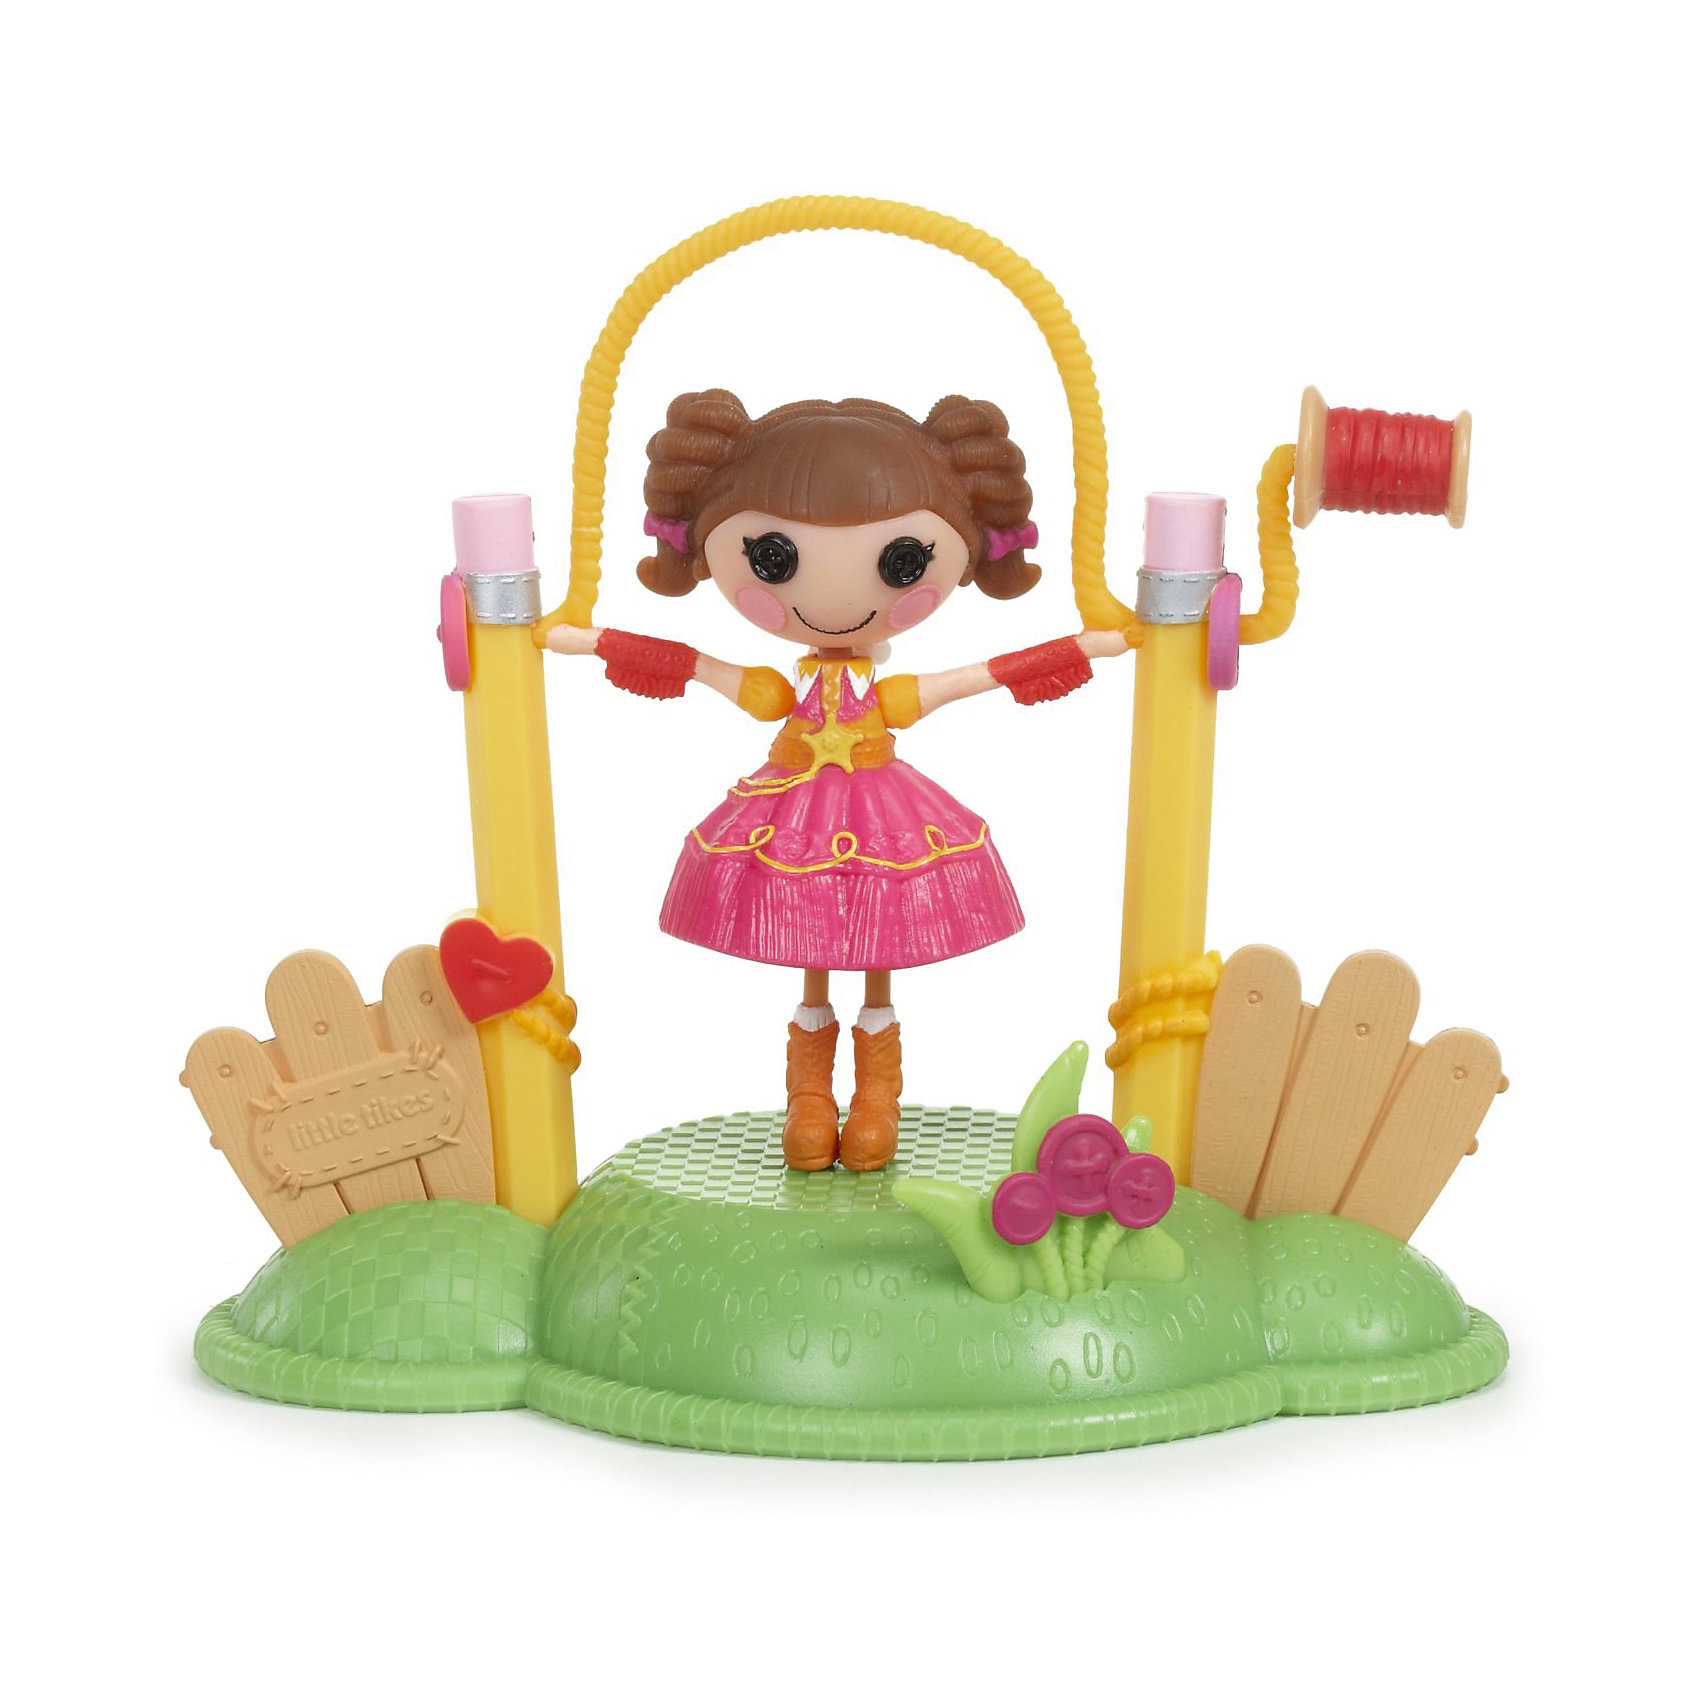 - Кукла Веселый спорт: Скакалка, Mini Lalaloopsy lalaloopsy кукла веселый спорт